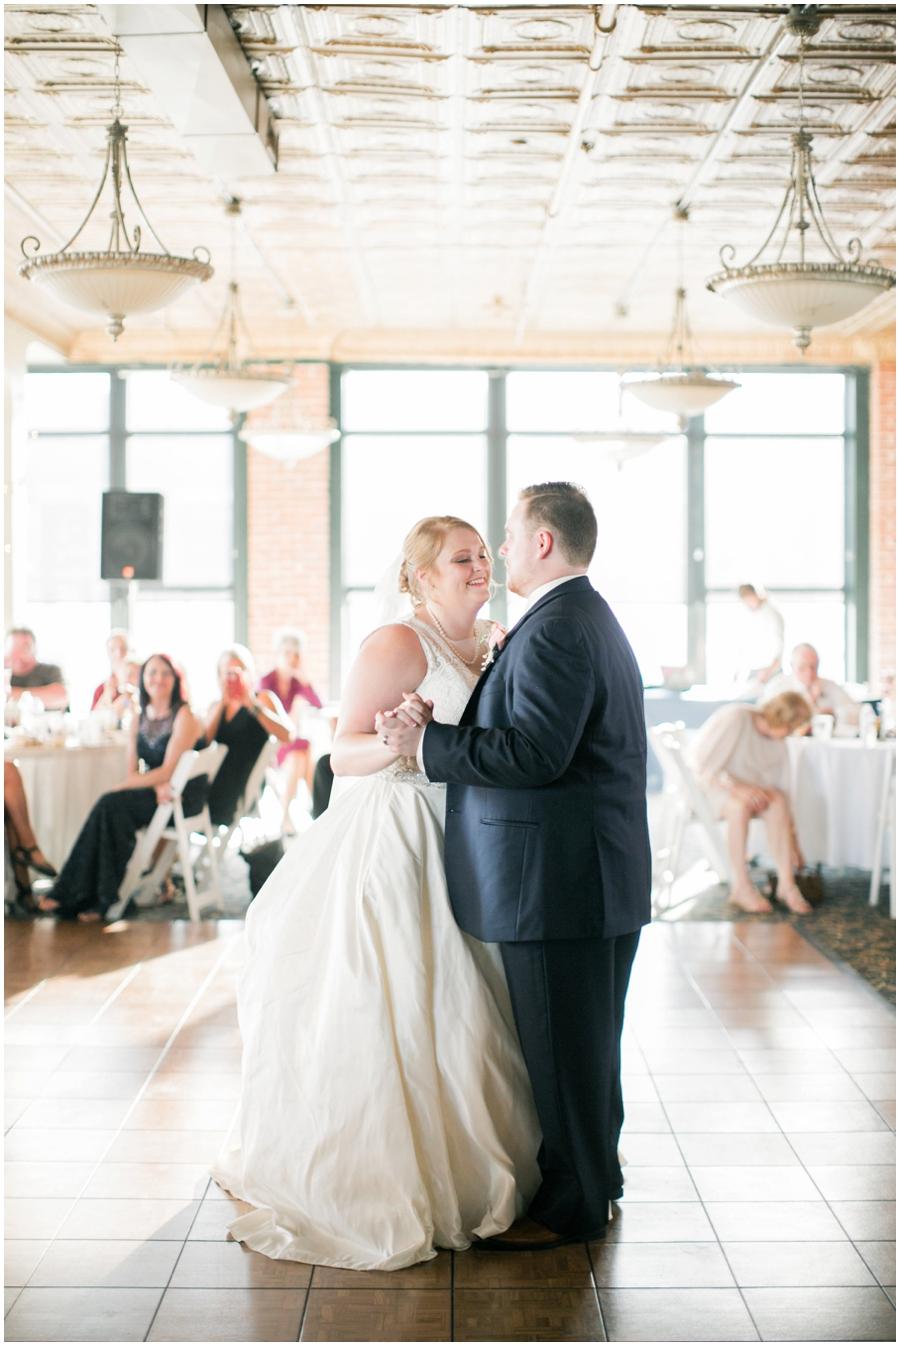 Joplin Missouri Wedding at the Ramsey - Jordan Brittley Photography_0029.jpg